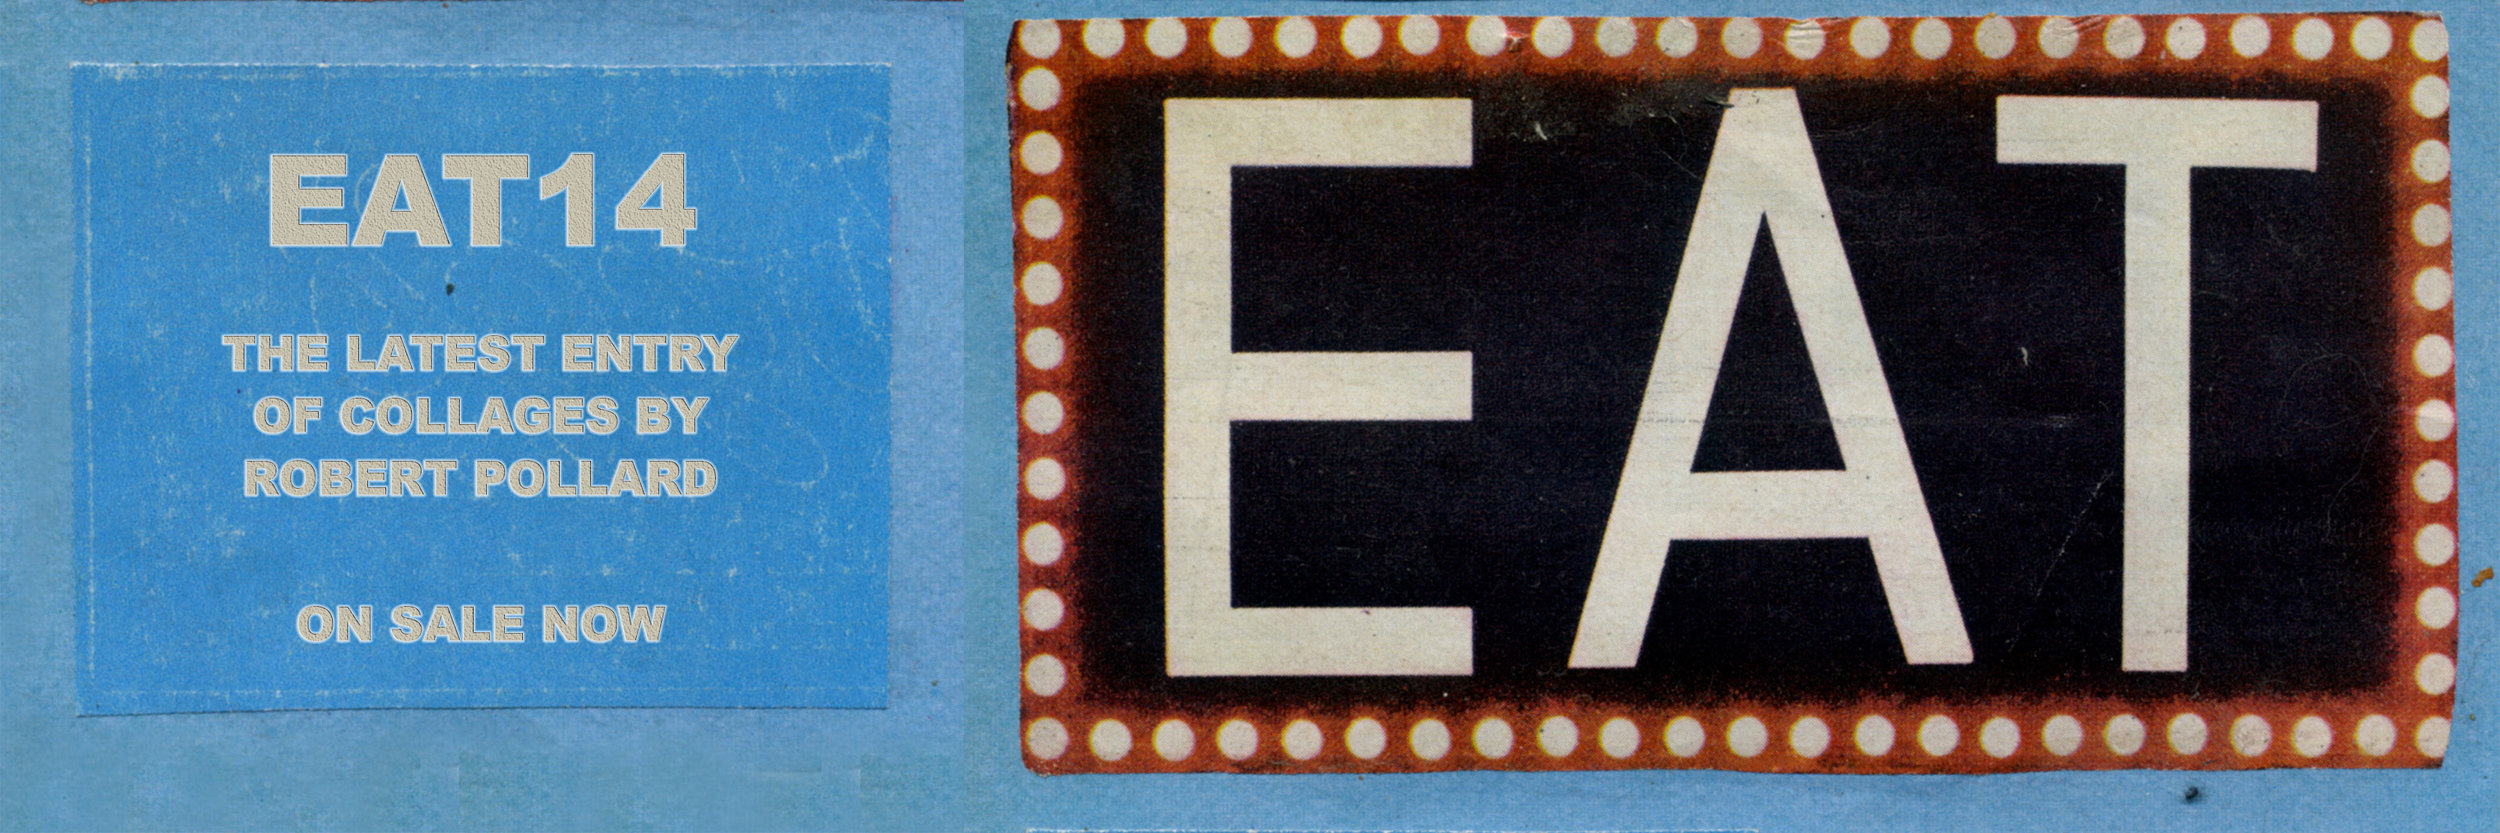 EAT14.jpg